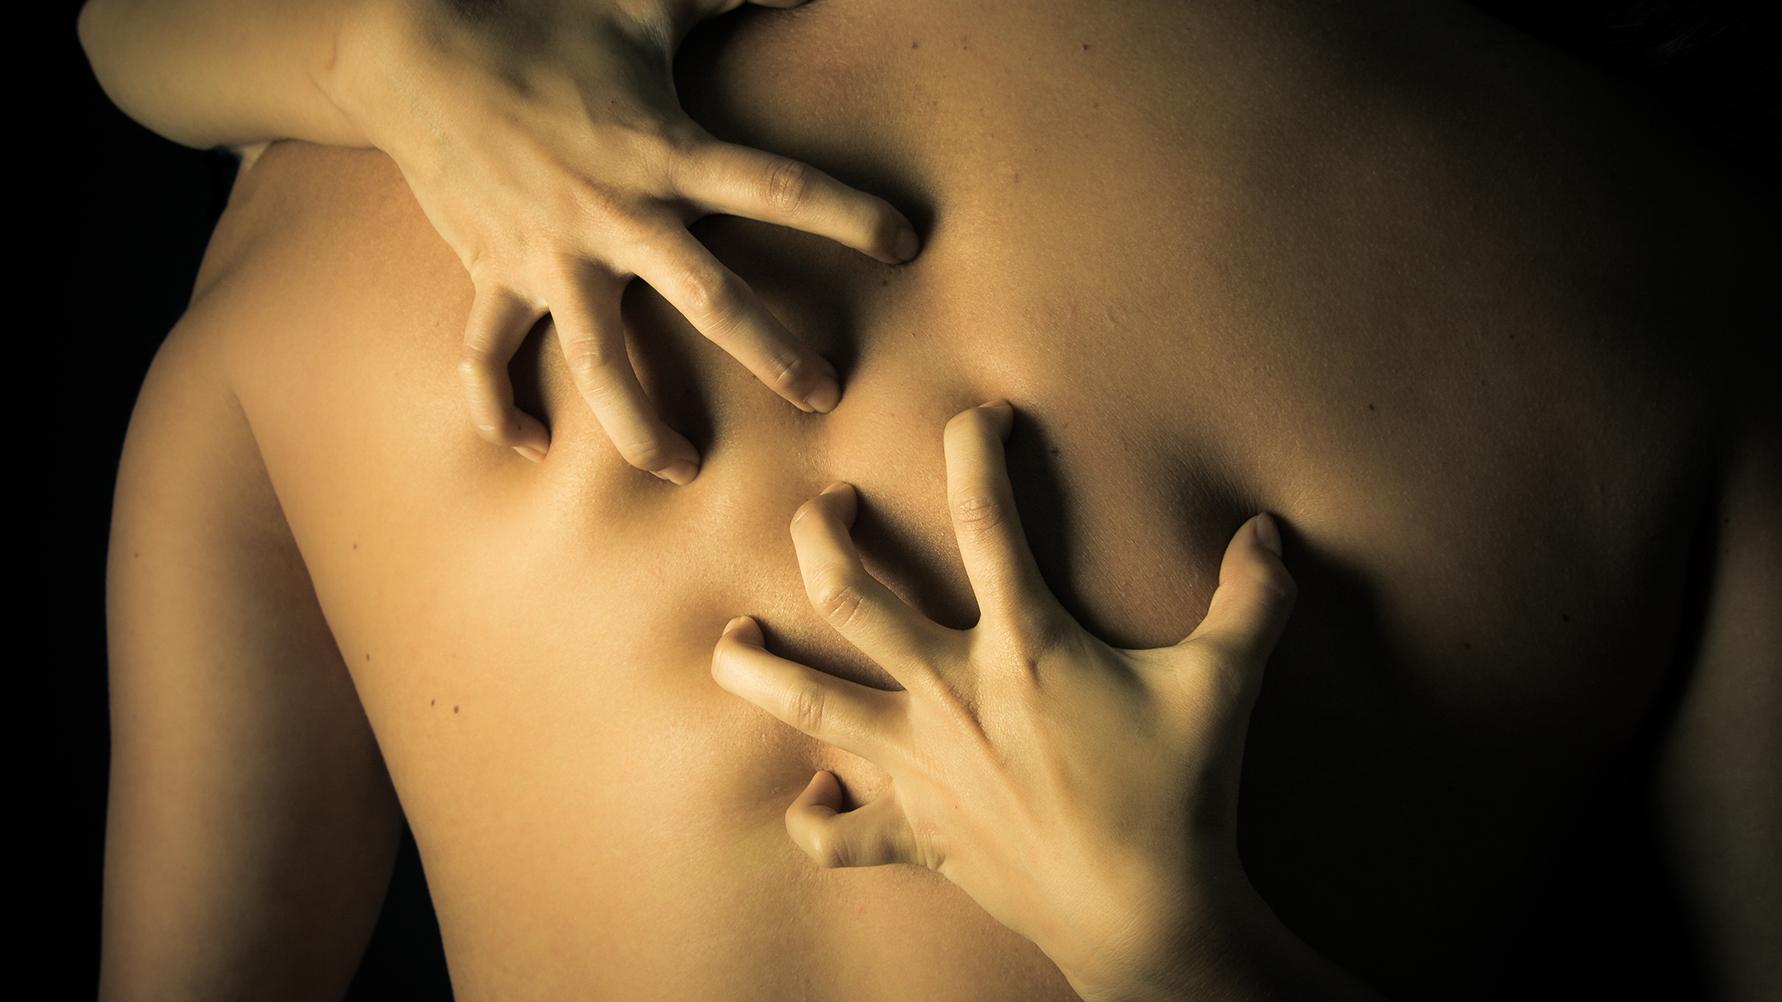 esther-perel-erotic-bg.jpg